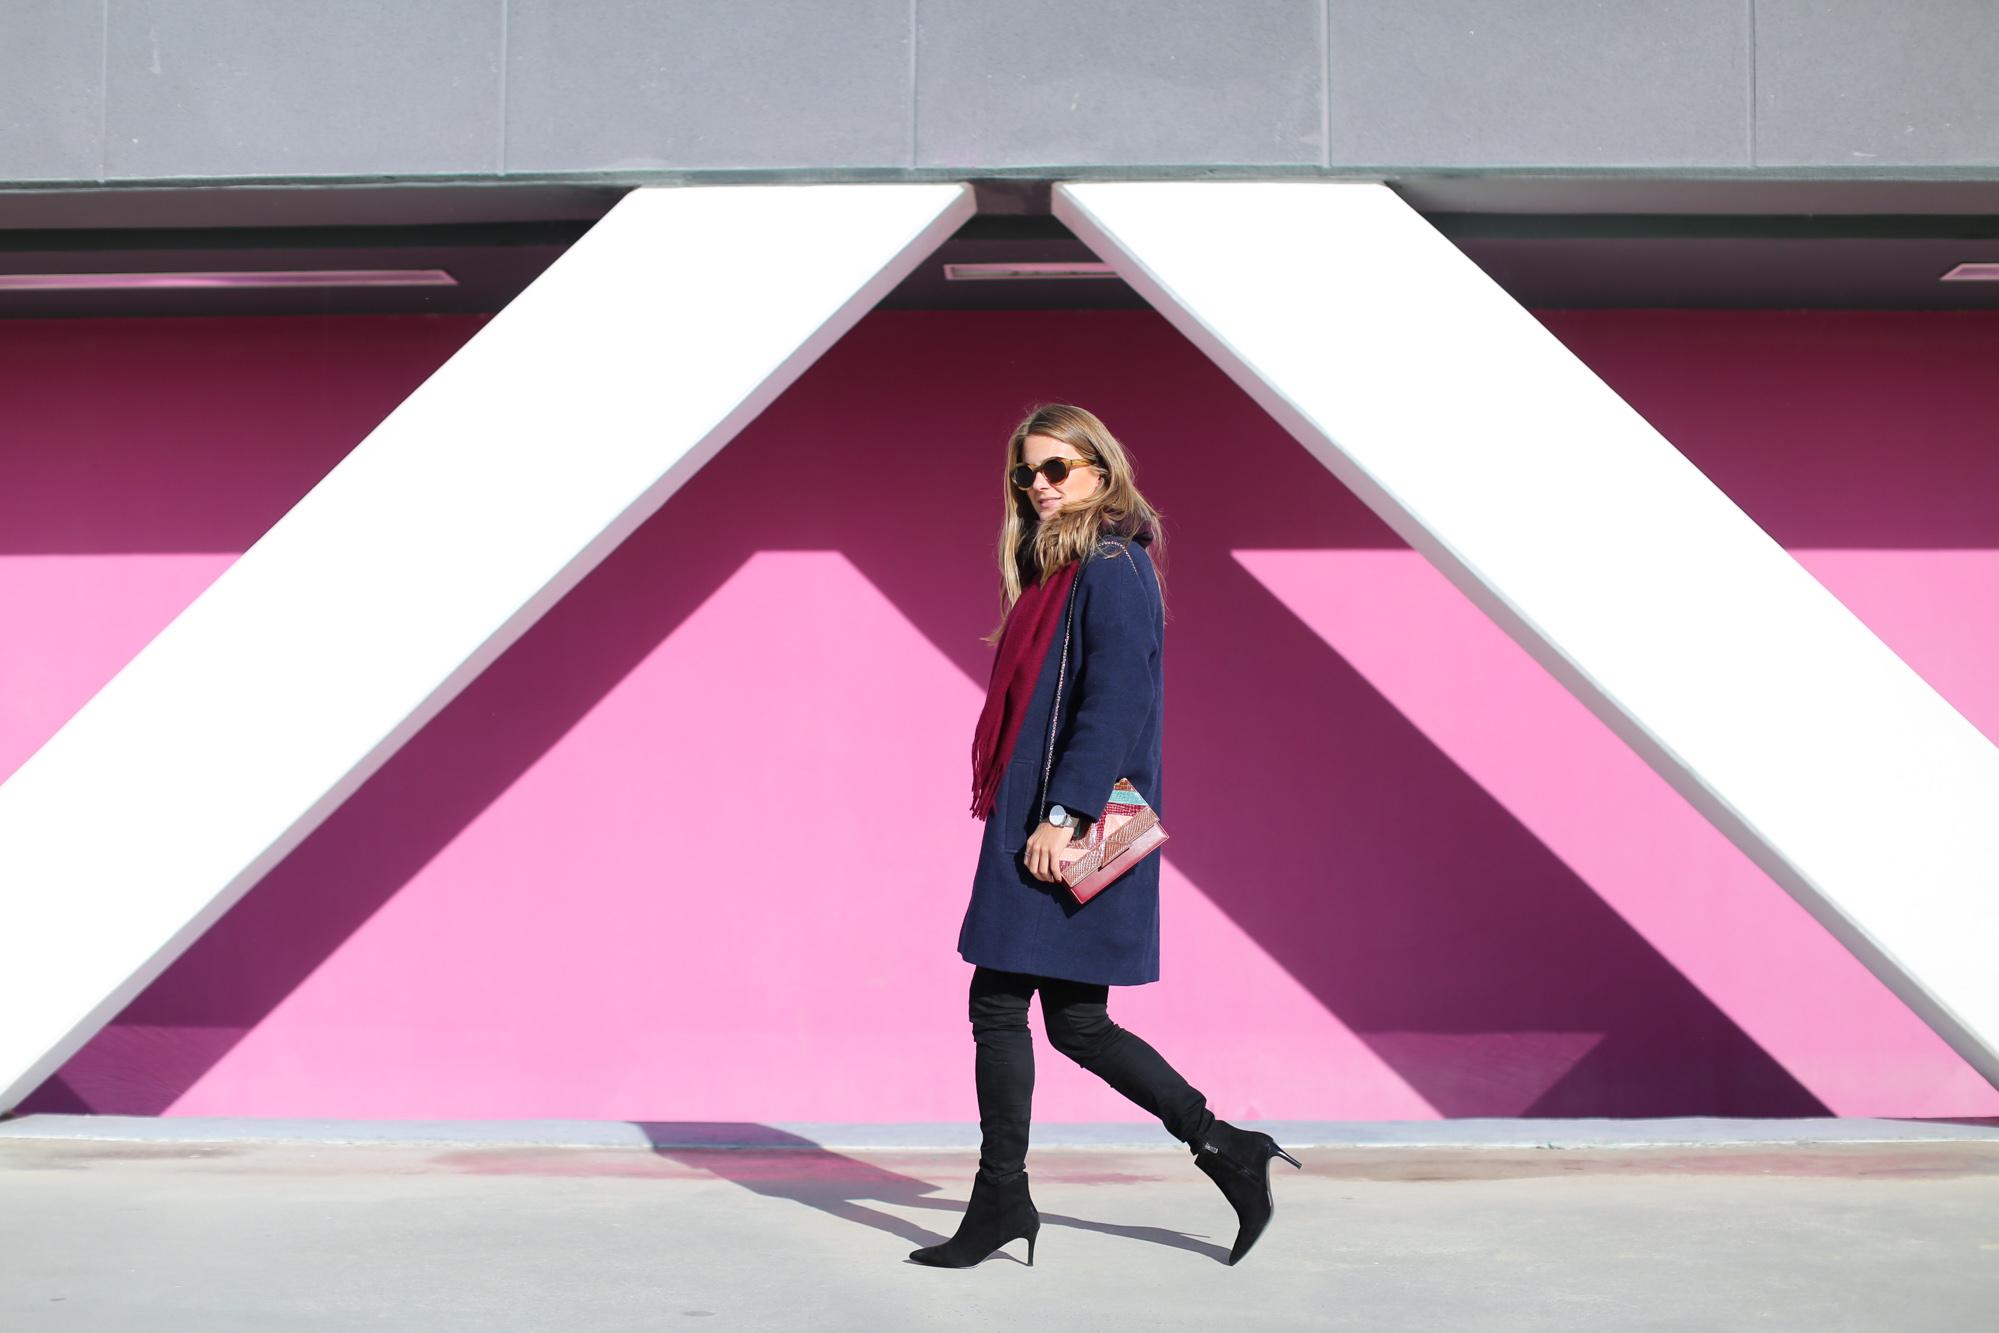 Clochet_fashionblogger_streetstyle_&otherstories_stilettoankleboots_burgundyheroscarf_metallicflowerssweater_titamadridspiga